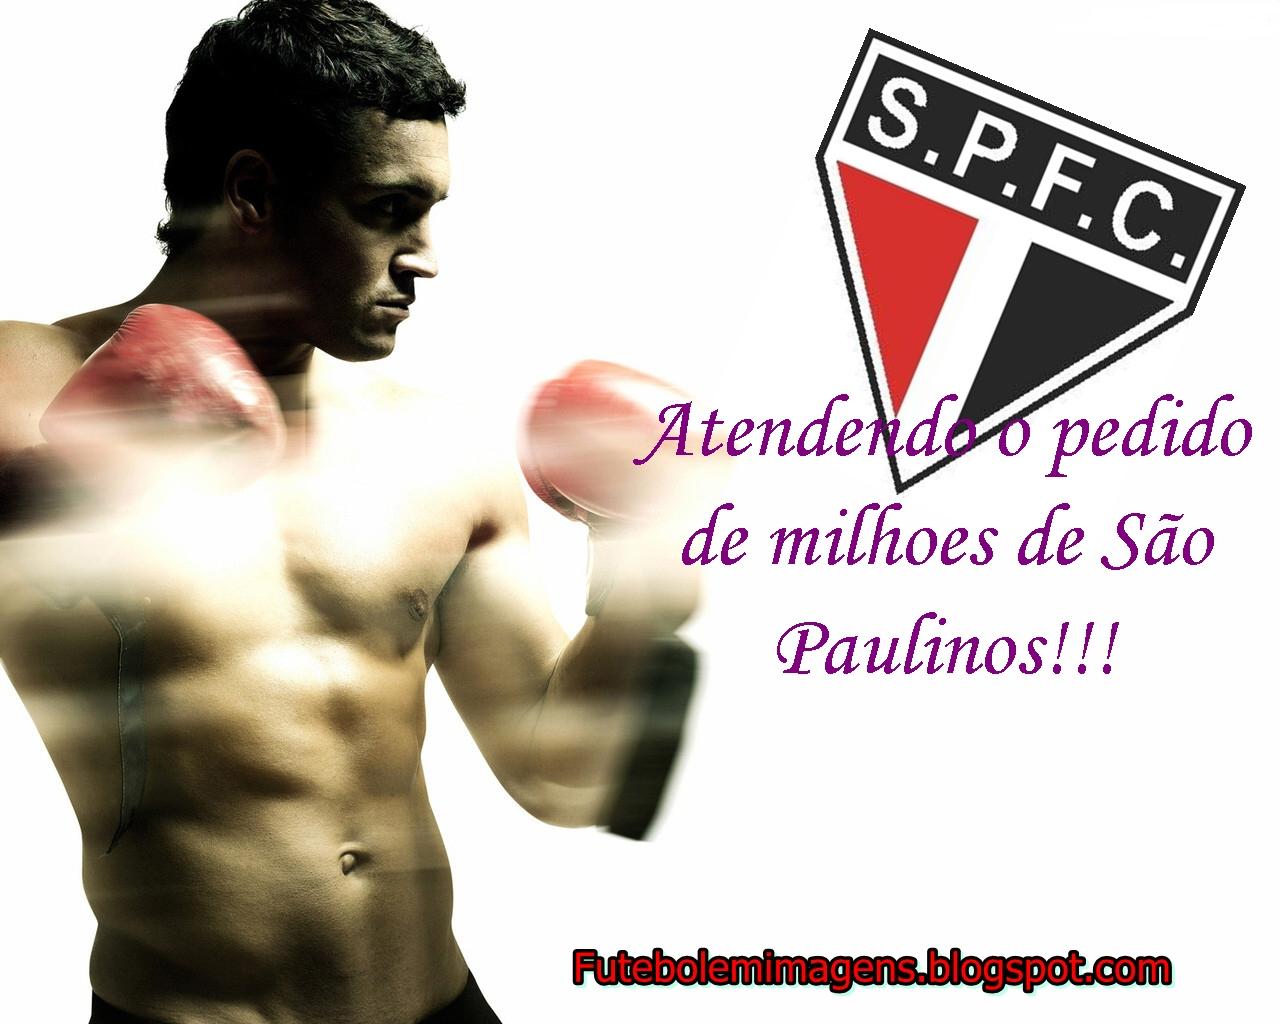 http://3.bp.blogspot.com/_Us0LKdm0Jkg/TKmDggvplUI/AAAAAAAAAY8/tgoOsjPLq-o/s1600/Wallpaper+de+Futebol033.jpg